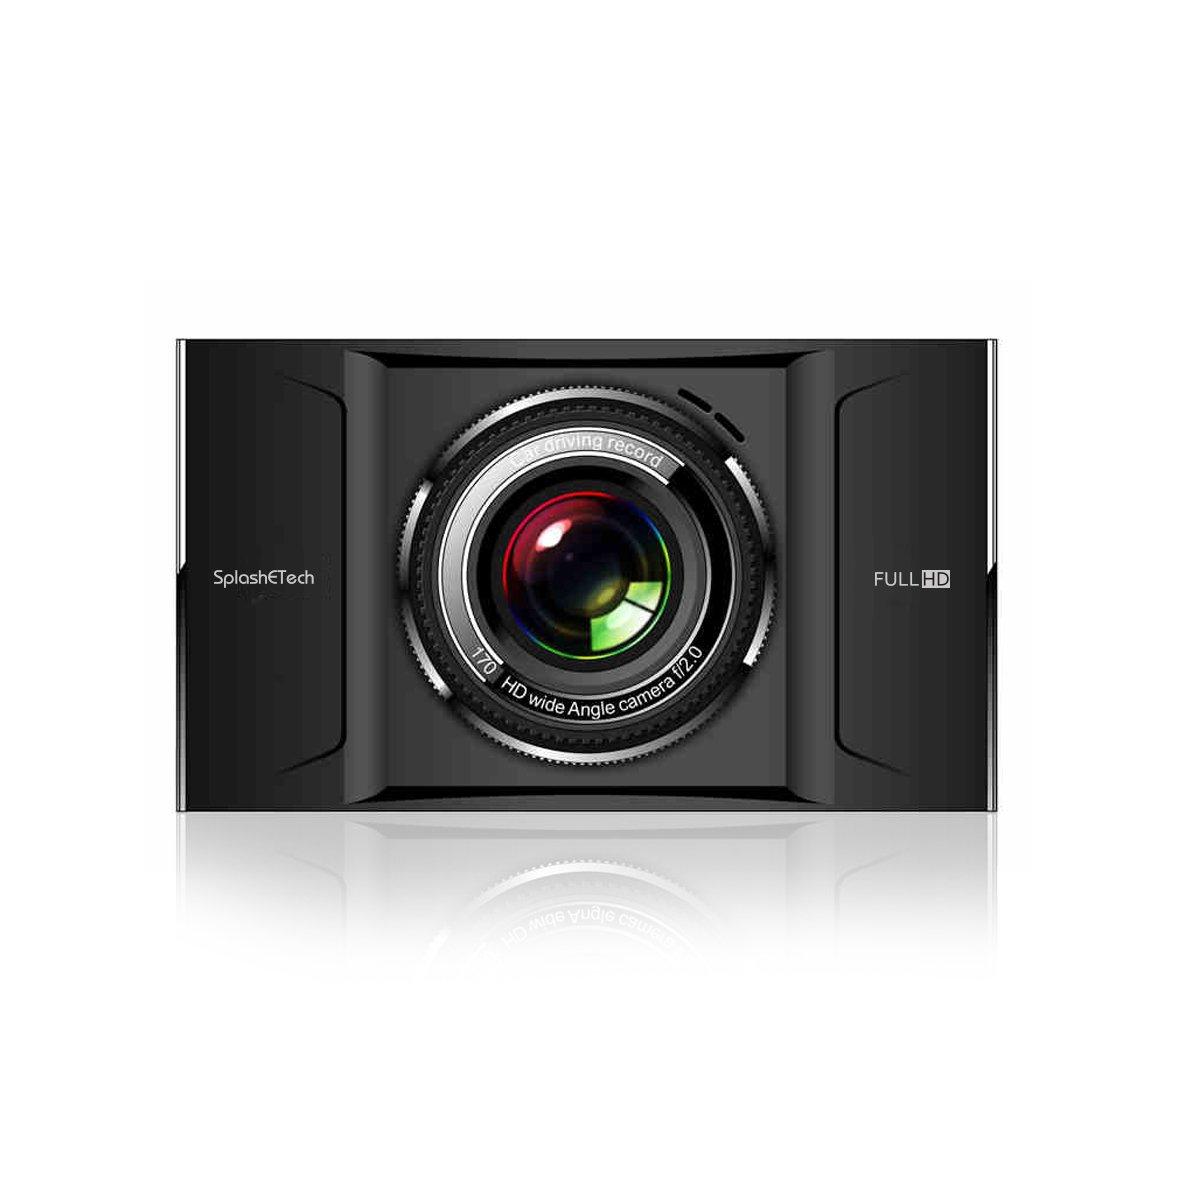 SplashECTech Dash Cam Dual-Lens Ultrathin Super Night Vision -, 4'' Screen 170°, 110°Angle, WDR,1080P, G-Sensor, Parking Guard